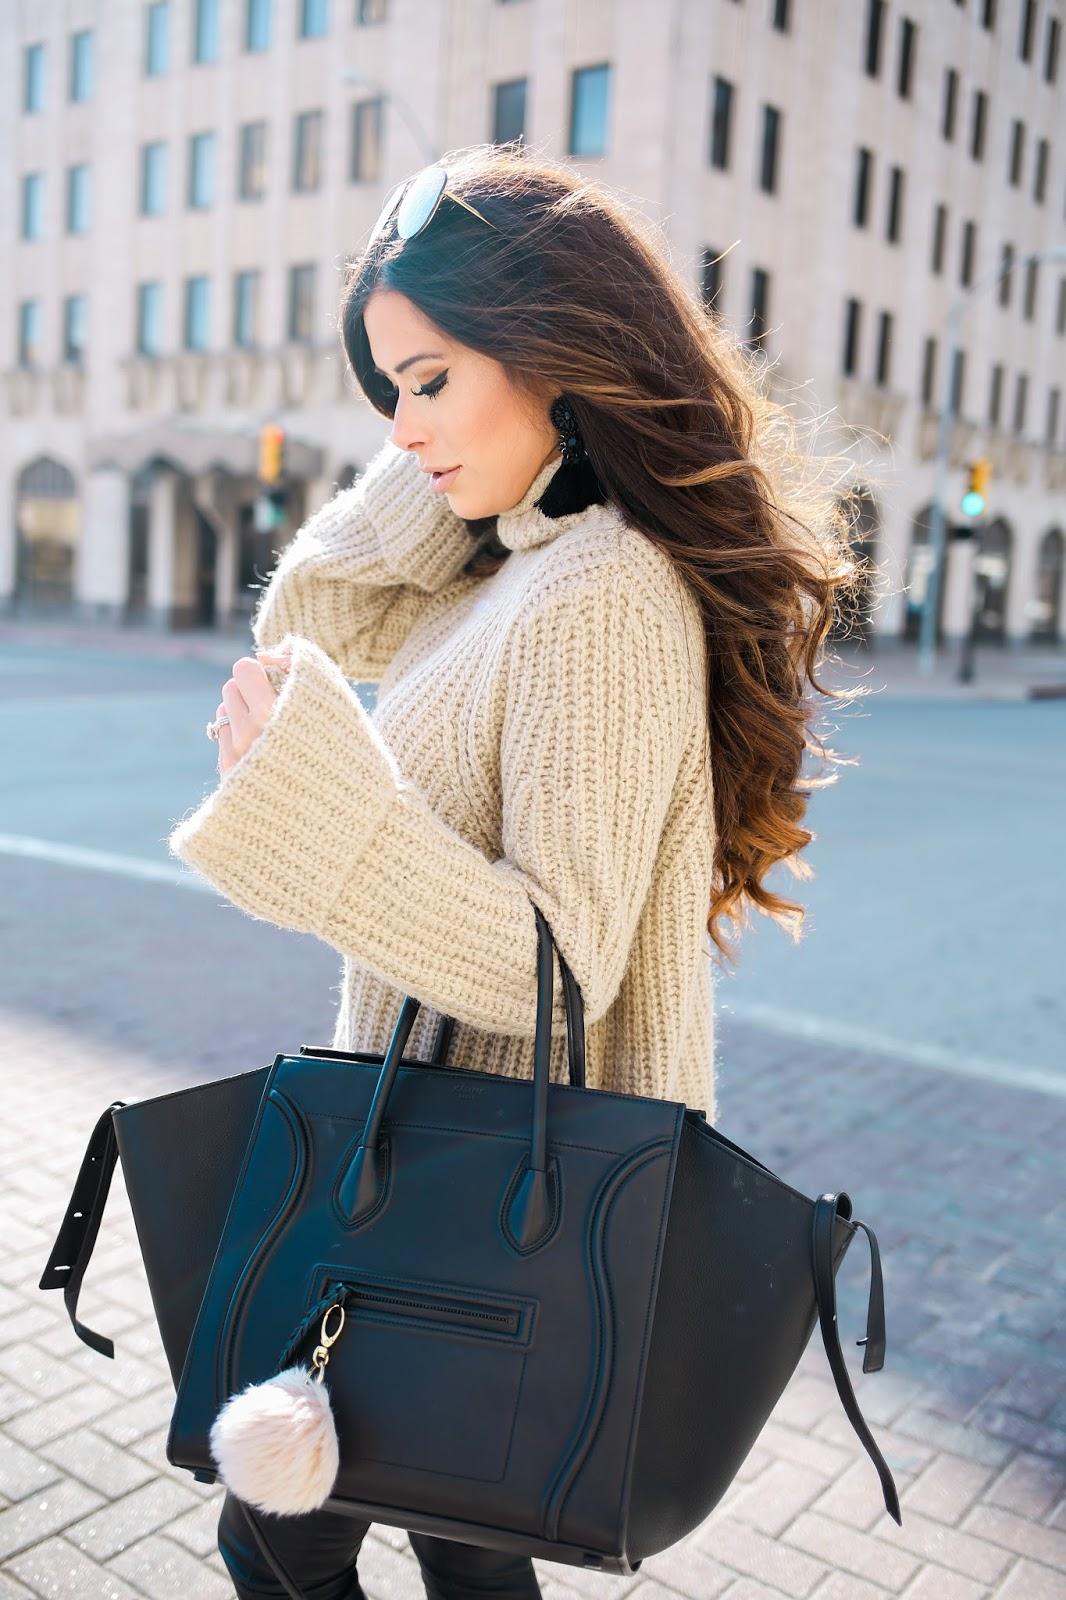 Young woman wearing an oversized bag